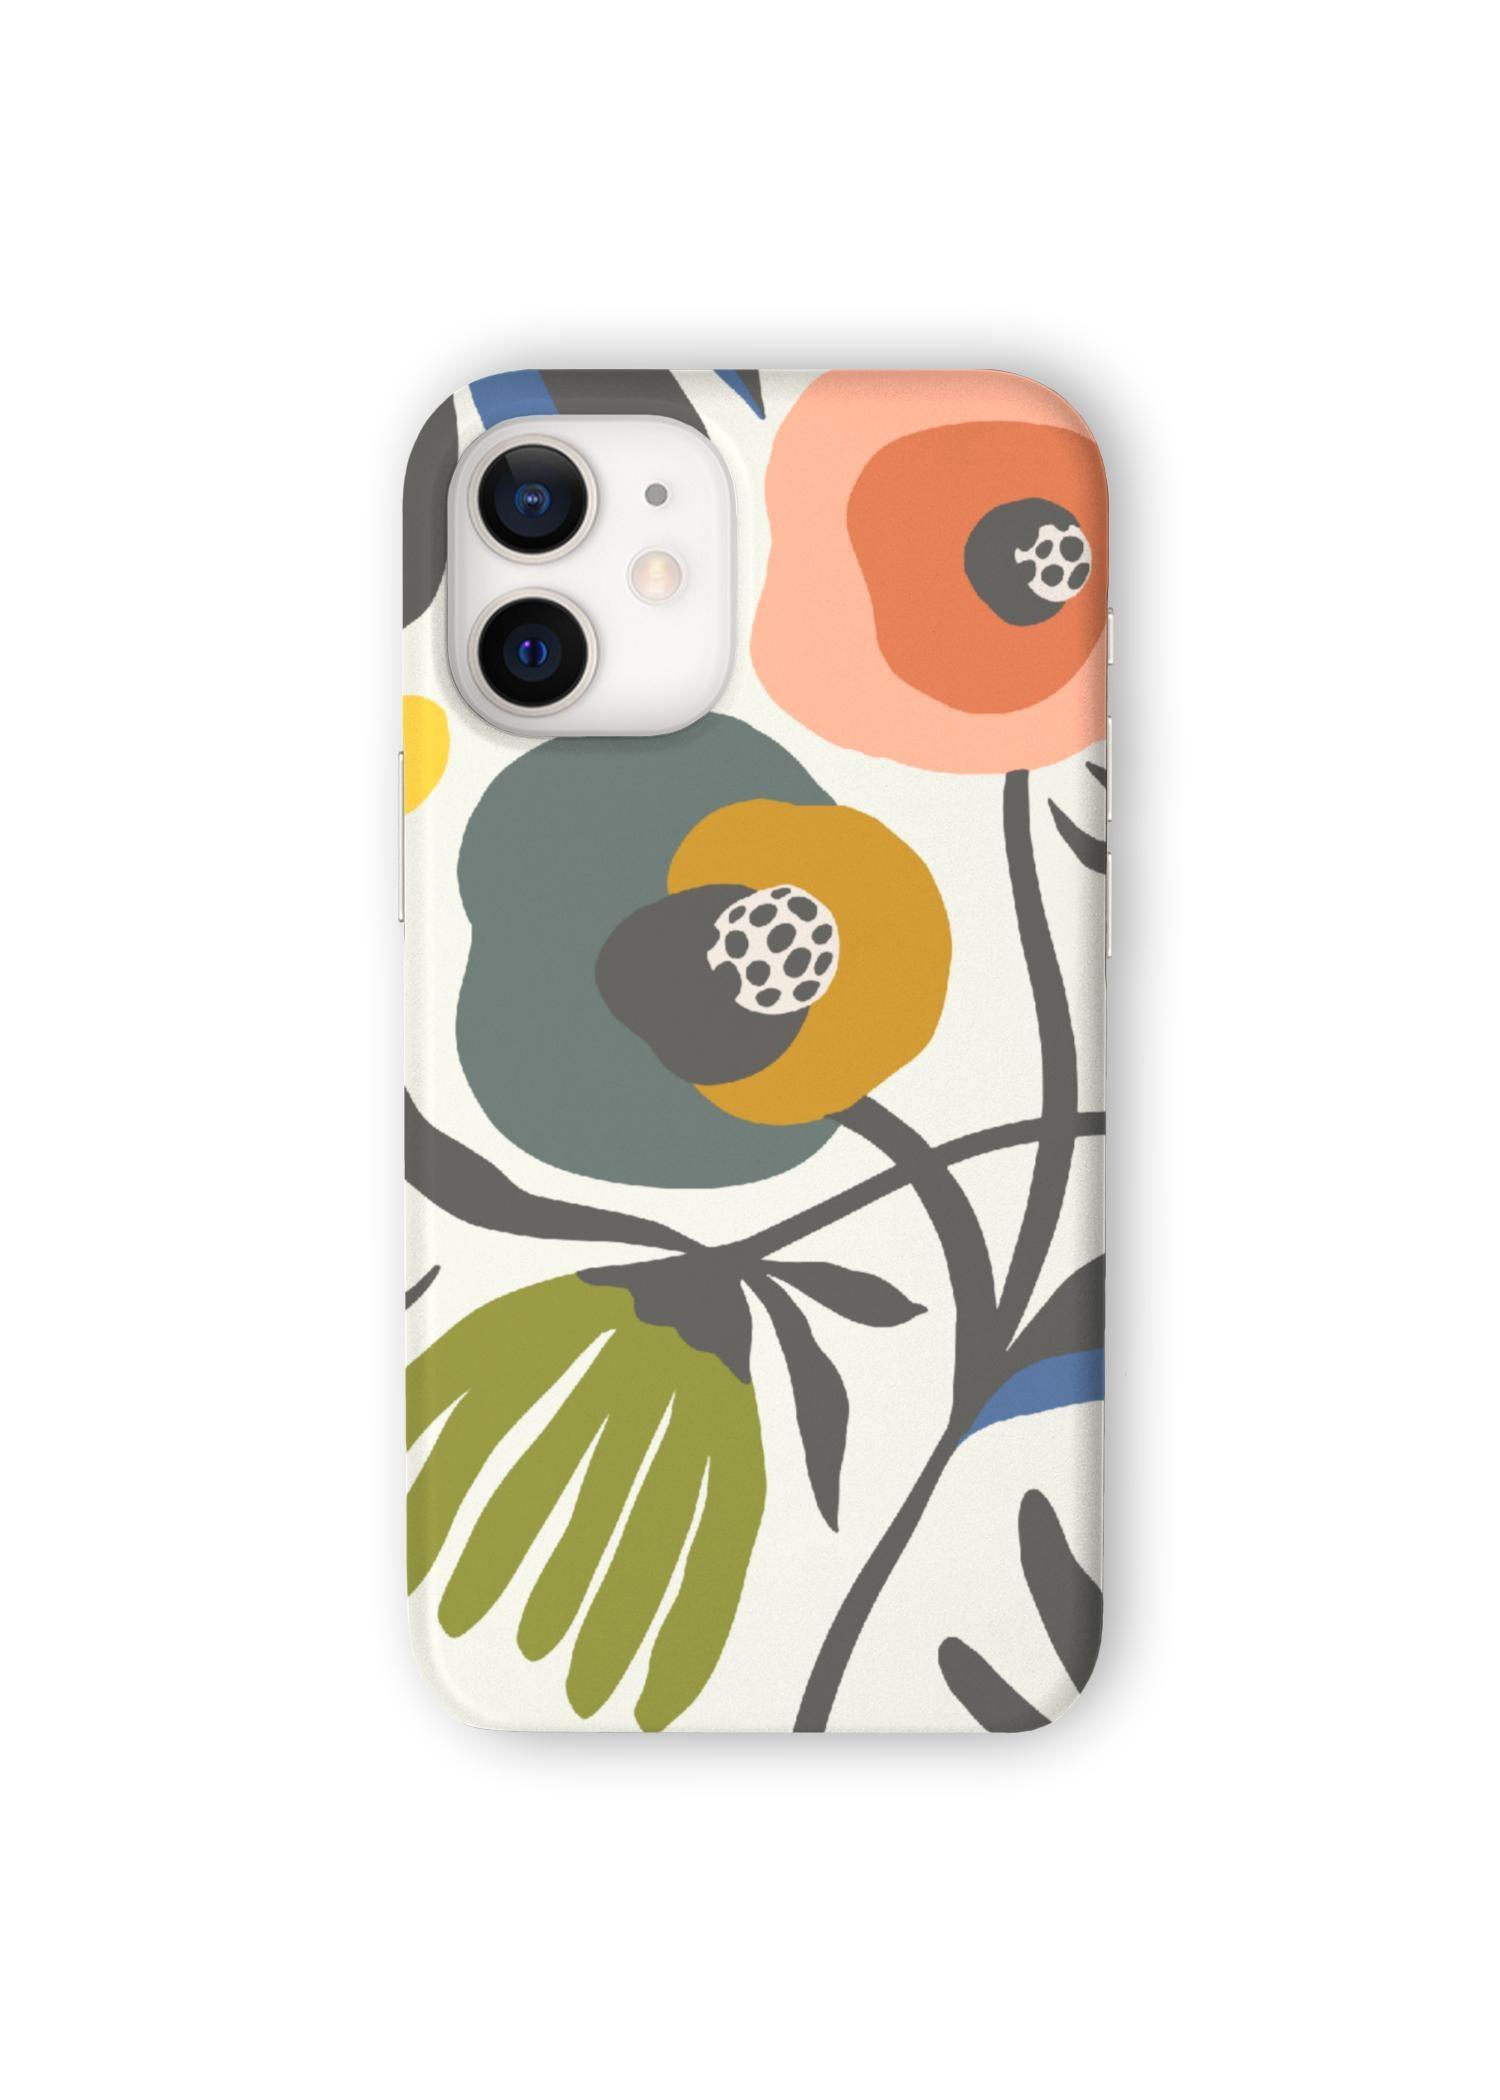 VIDA iPhone Case - Secret Garden by VIDA Original Artist  - Size: iPhone 12 Mini / Ultraslim